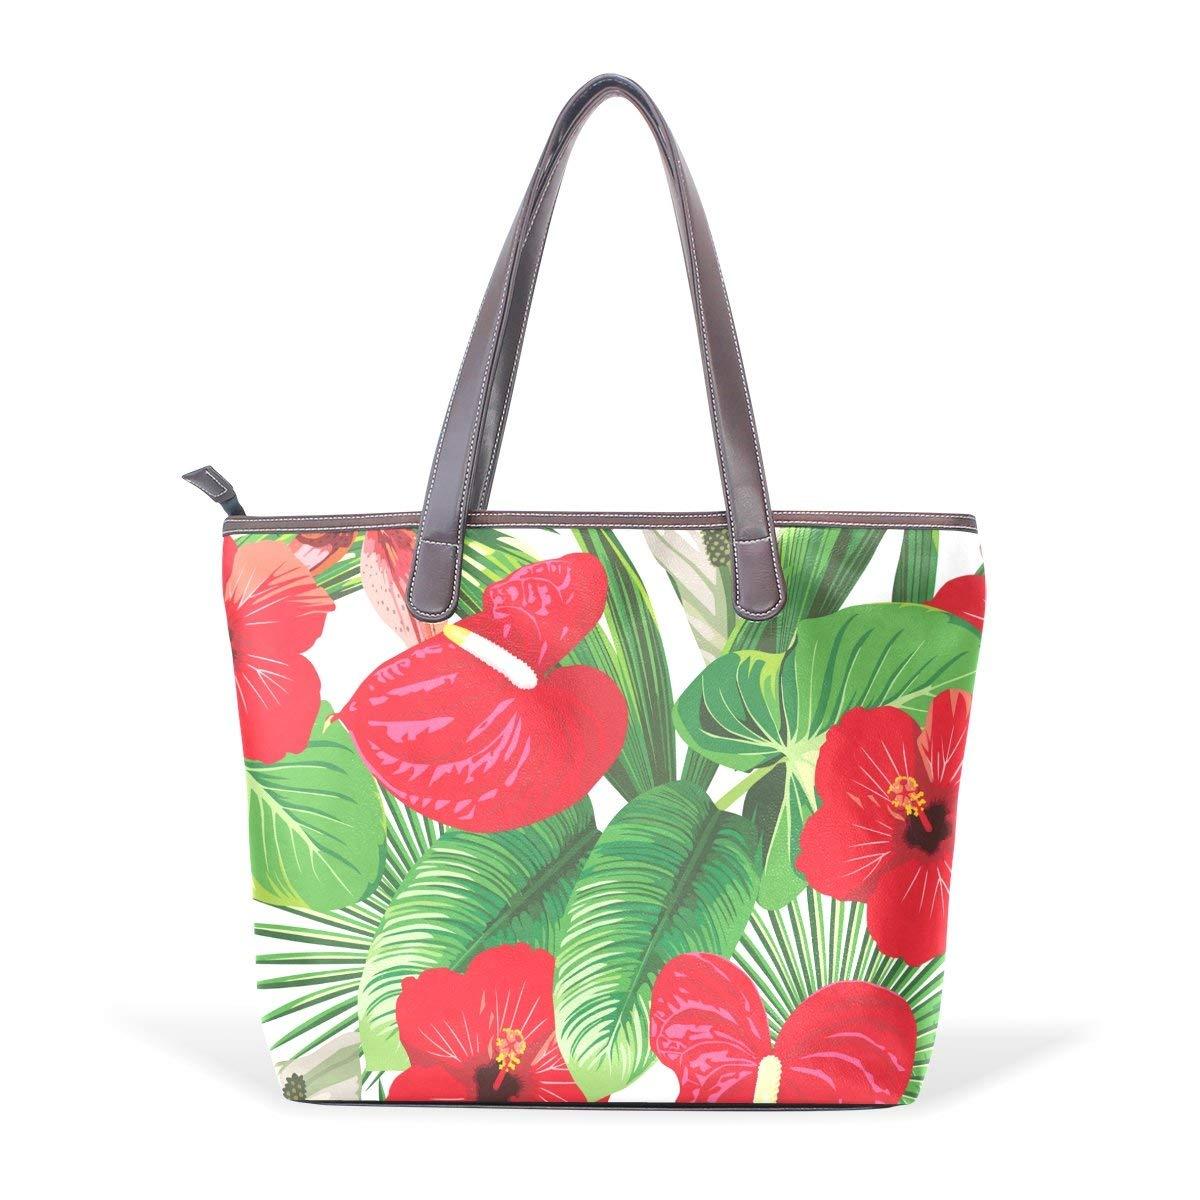 Tropical Floral Print Womens Fashion Large Tote Ladies Handbag Shoulder Bag